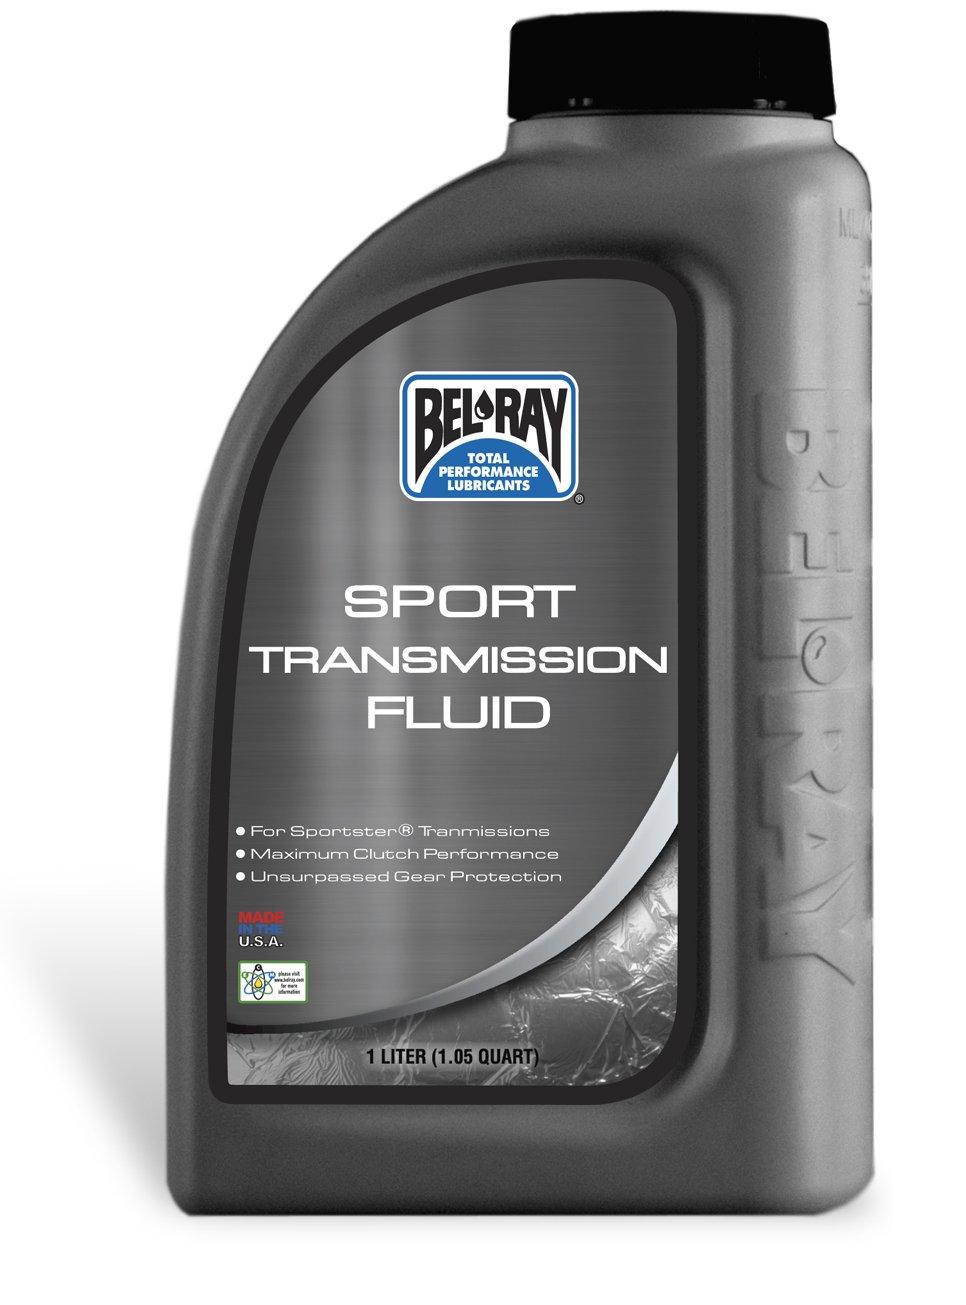 BEL-RAY トランスミッションオイル スポーツ 96925-BT1 96925-BT1 B007GR5KLE